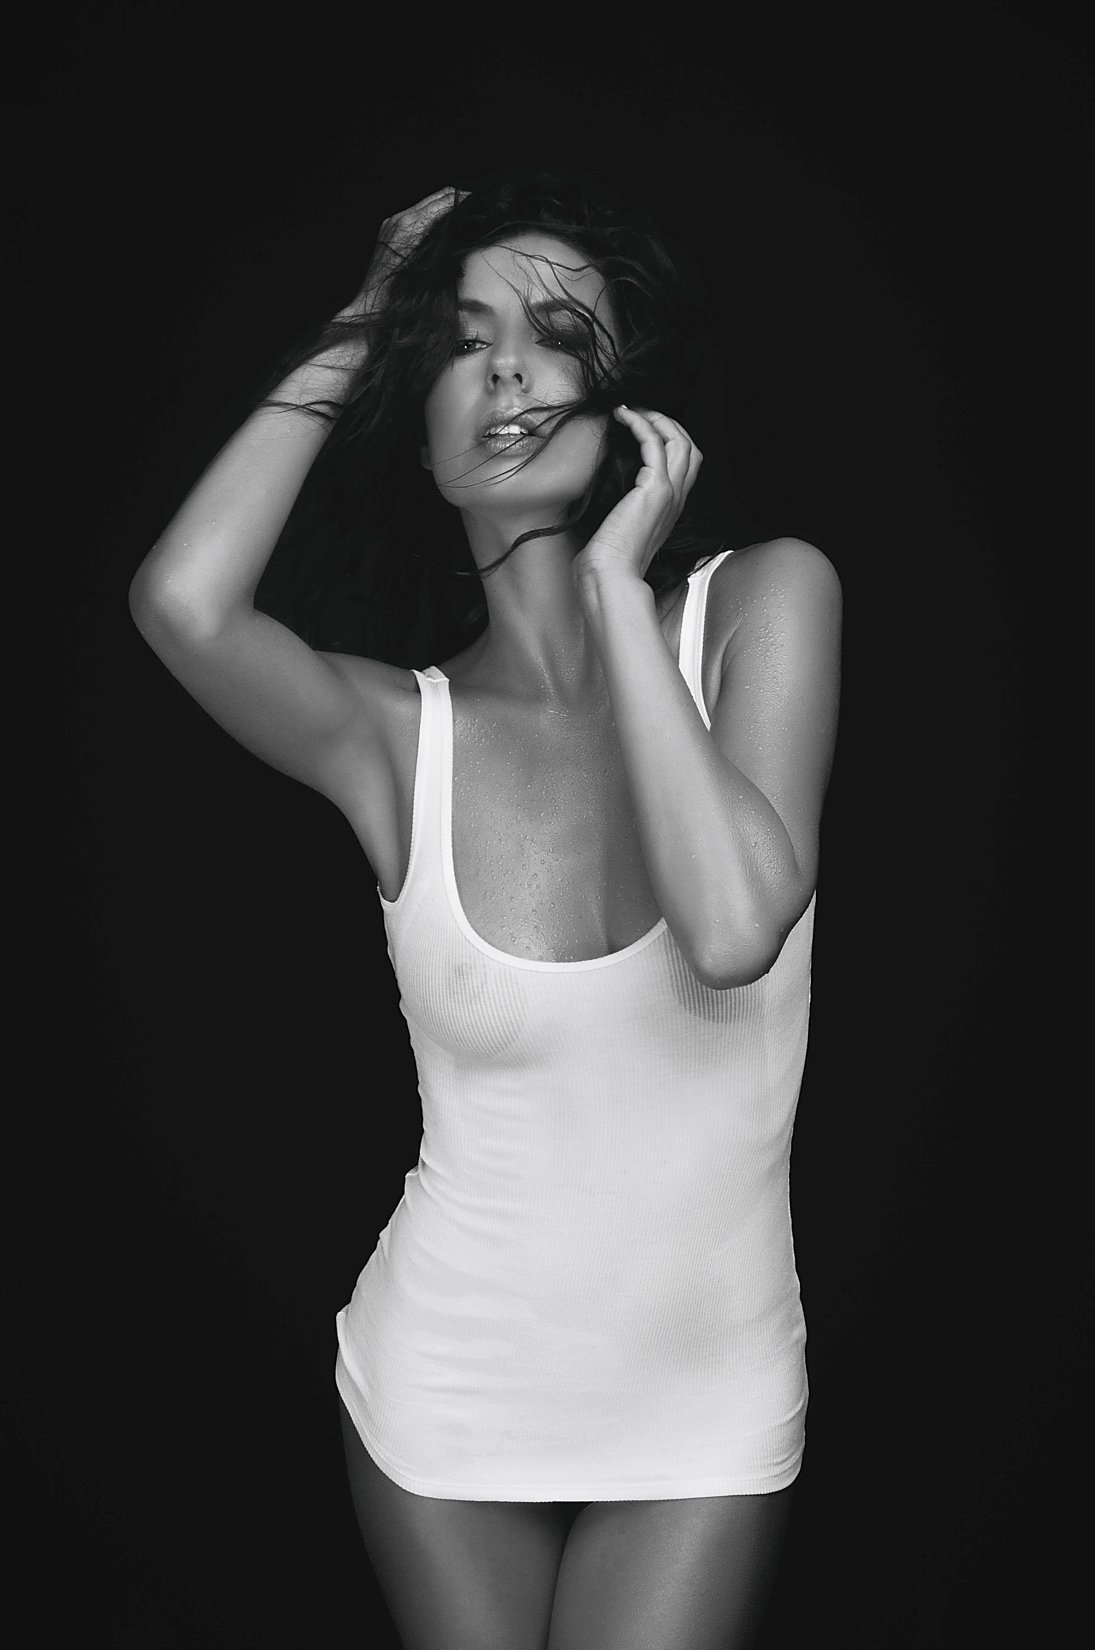 model, fine art, sexy, sensual, black and white, woman, female, body, erotica, glamour, curves, portrait, beautiful, fashion, portrait, hair,, Lajos Csáki